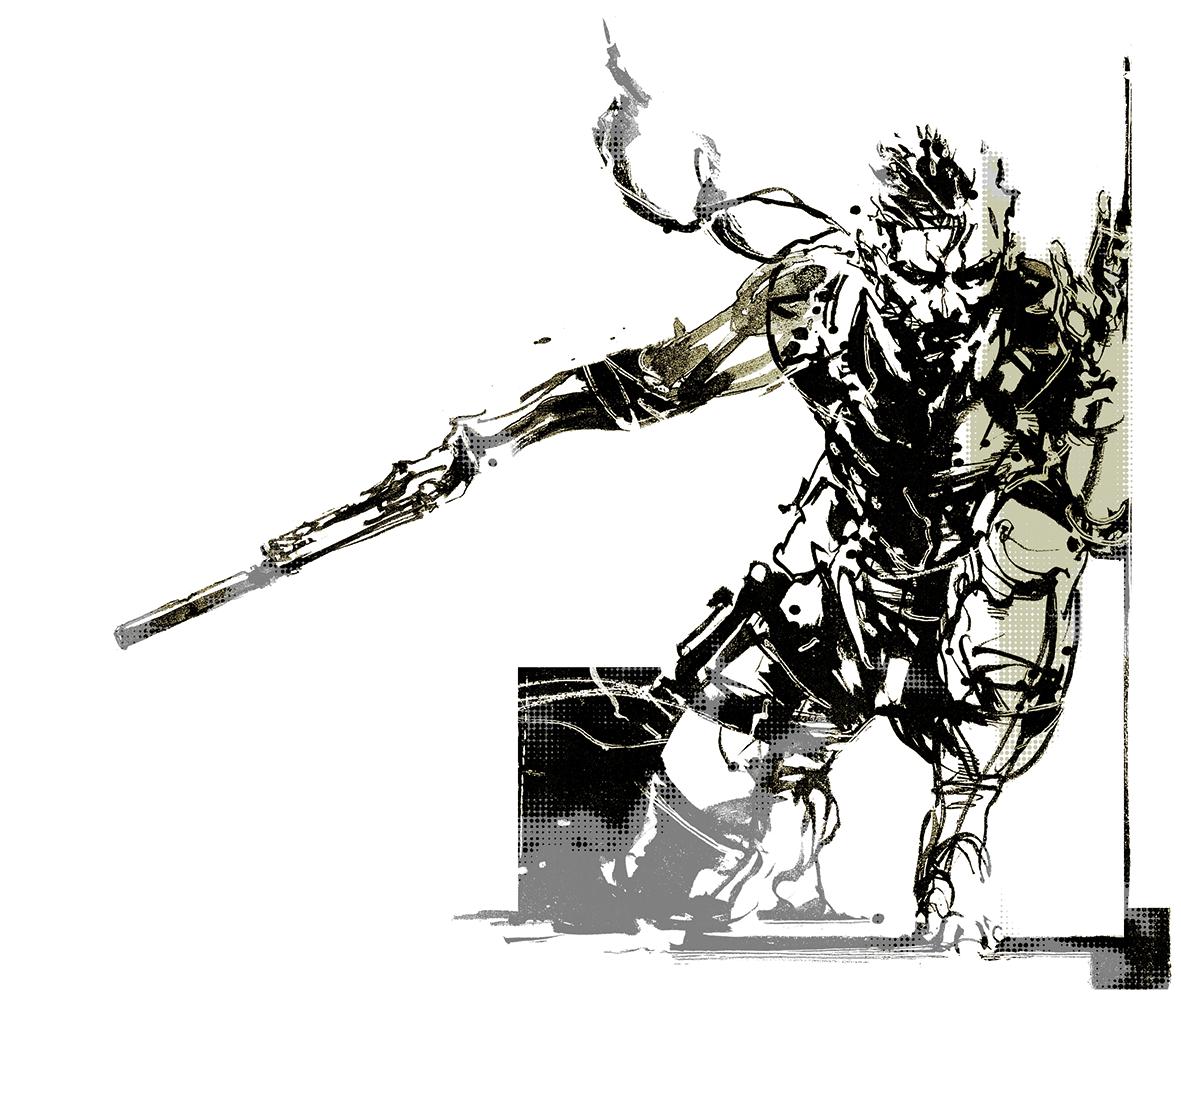 Yoji Shinkawa Art Part 1 Of Many Metalgearsolid Mgs Mgsv Metalgear Konami Cosplay Ps4 Game Mgsvtpp Metal Gear Metal Gear Rising Metal Gear Series